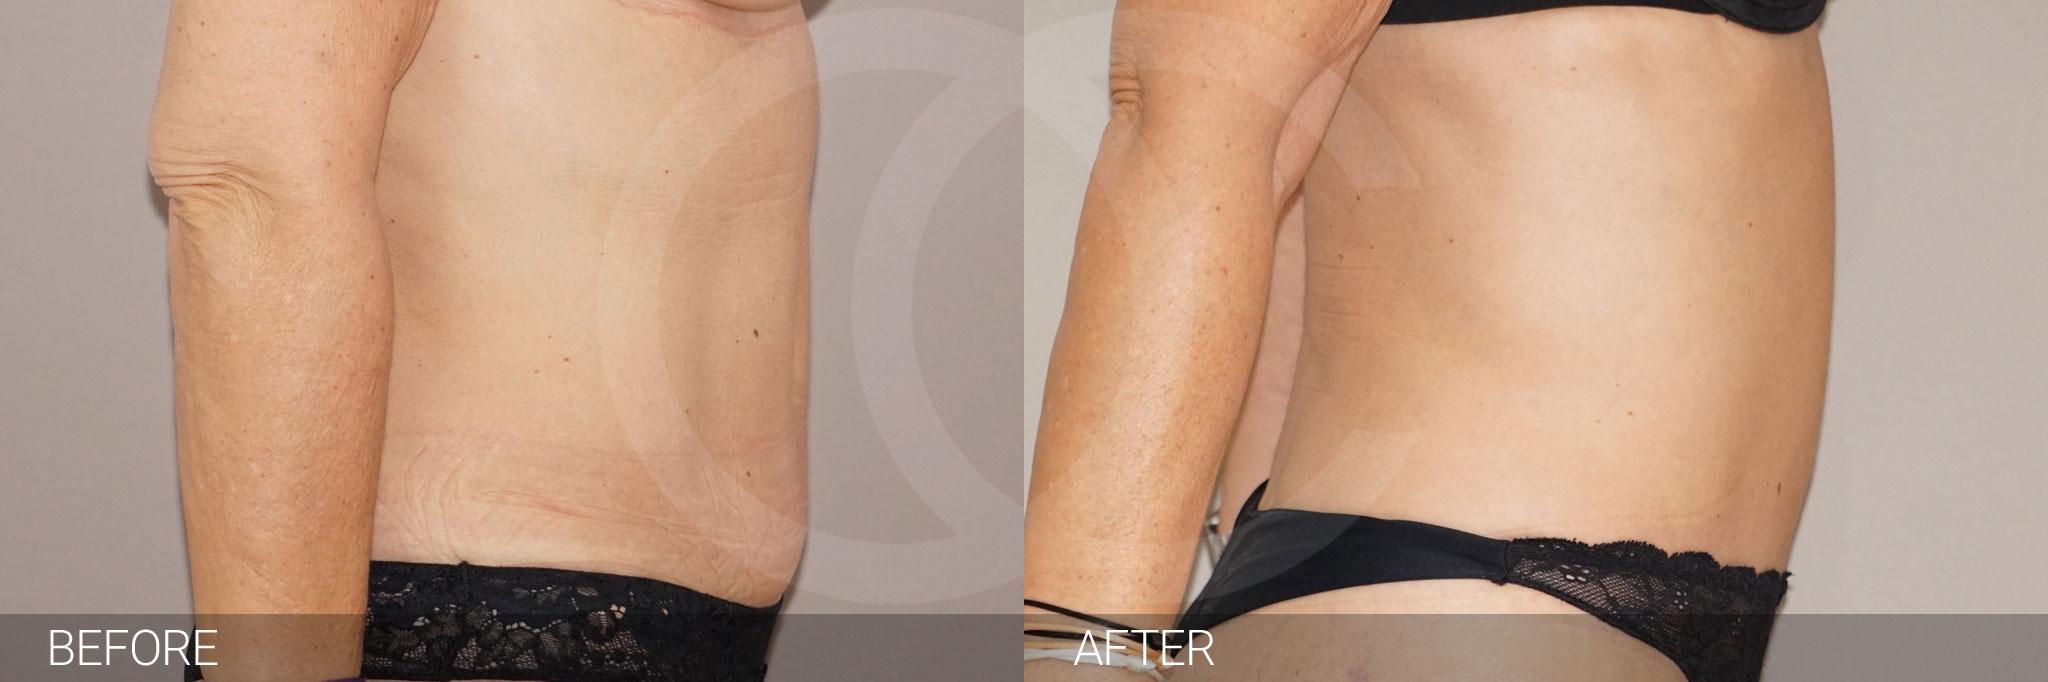 Abdominoplastia reducir de abdomen ante/post-op III